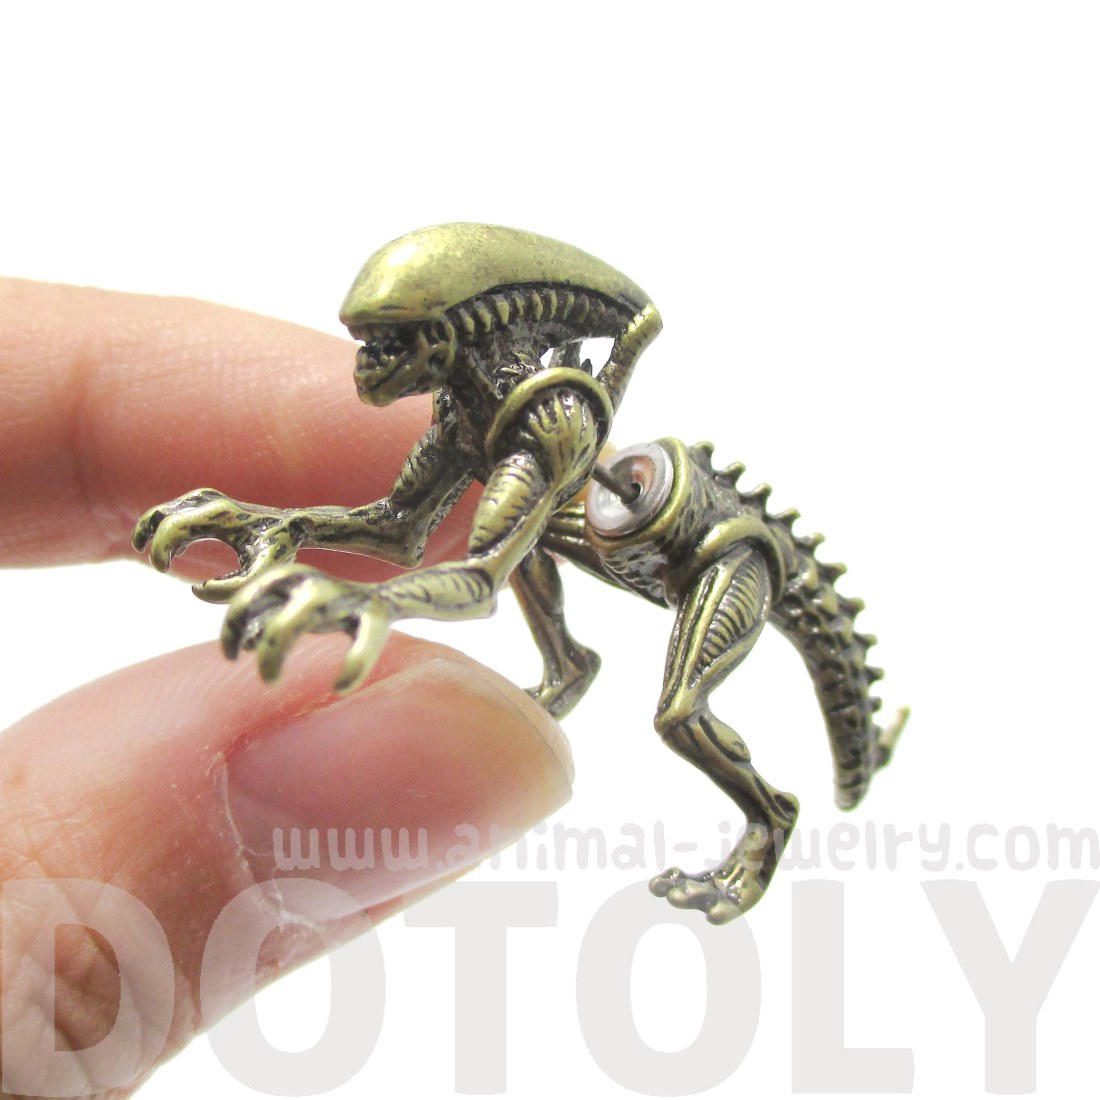 Predator Avp Xenomorph Shaped Front And Back Stud Earrings In Brass   Thumbnail